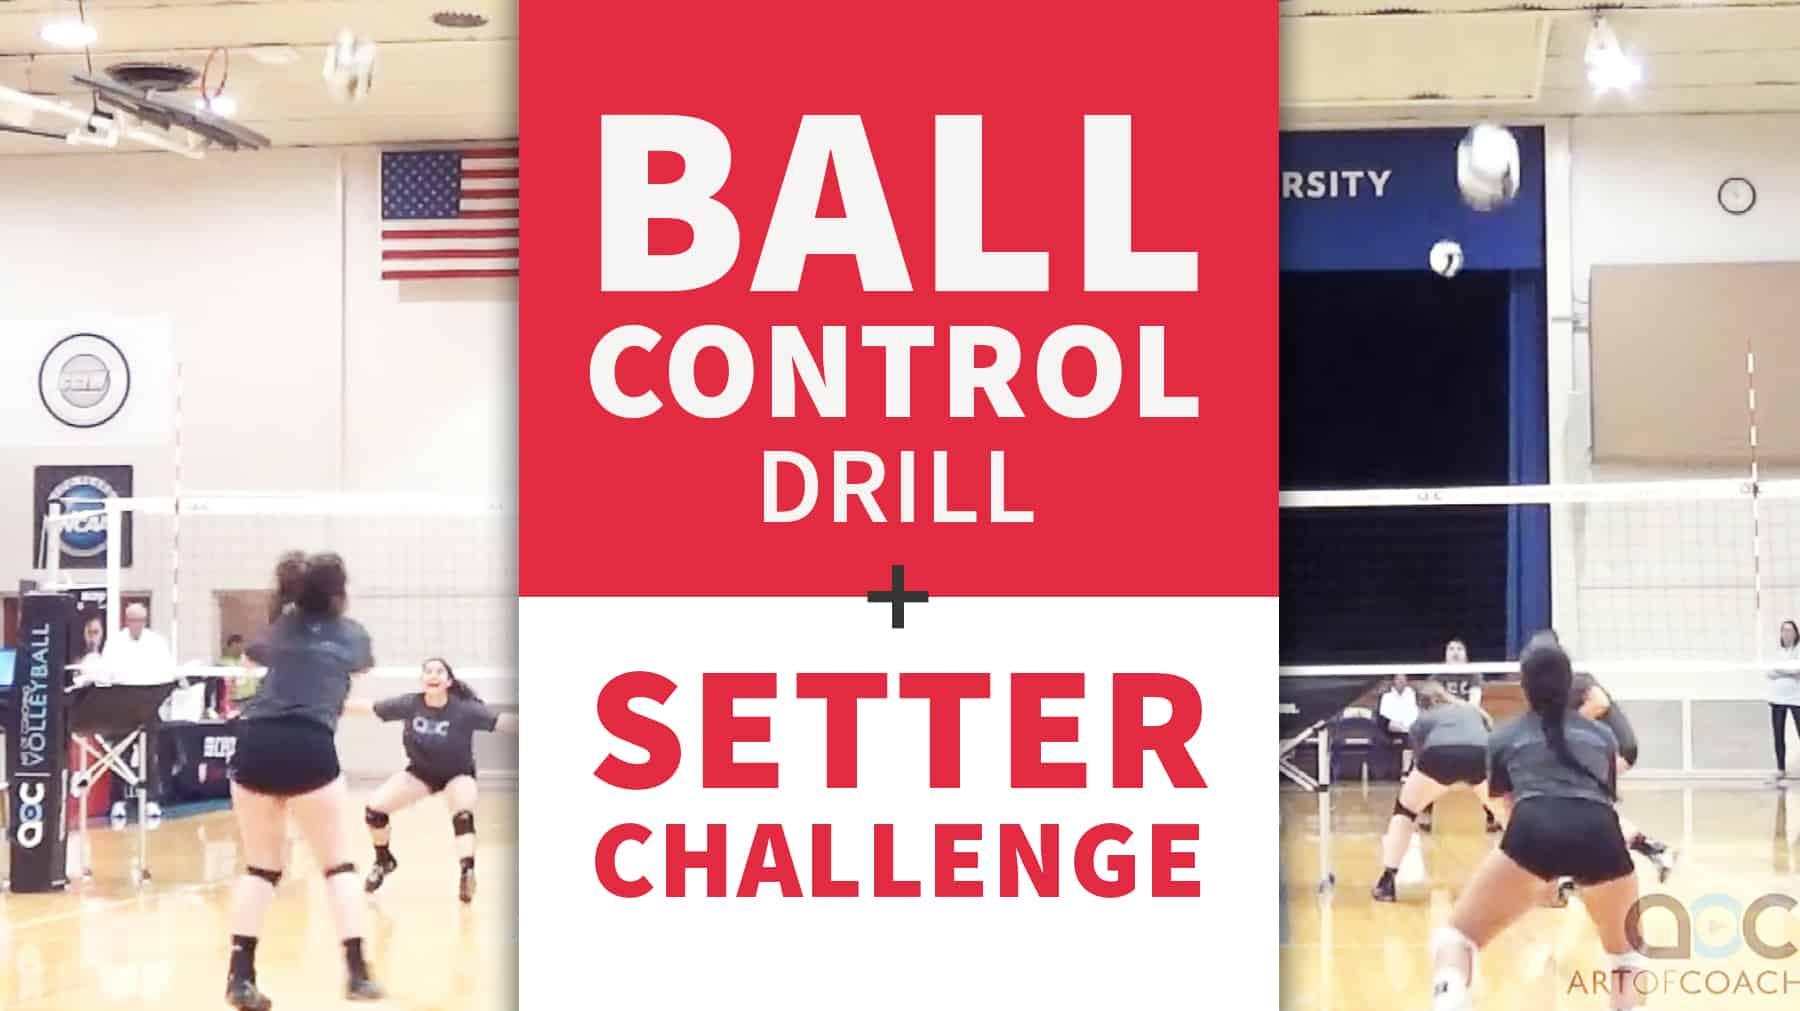 Ball Control Drill Plus Setter Challenge